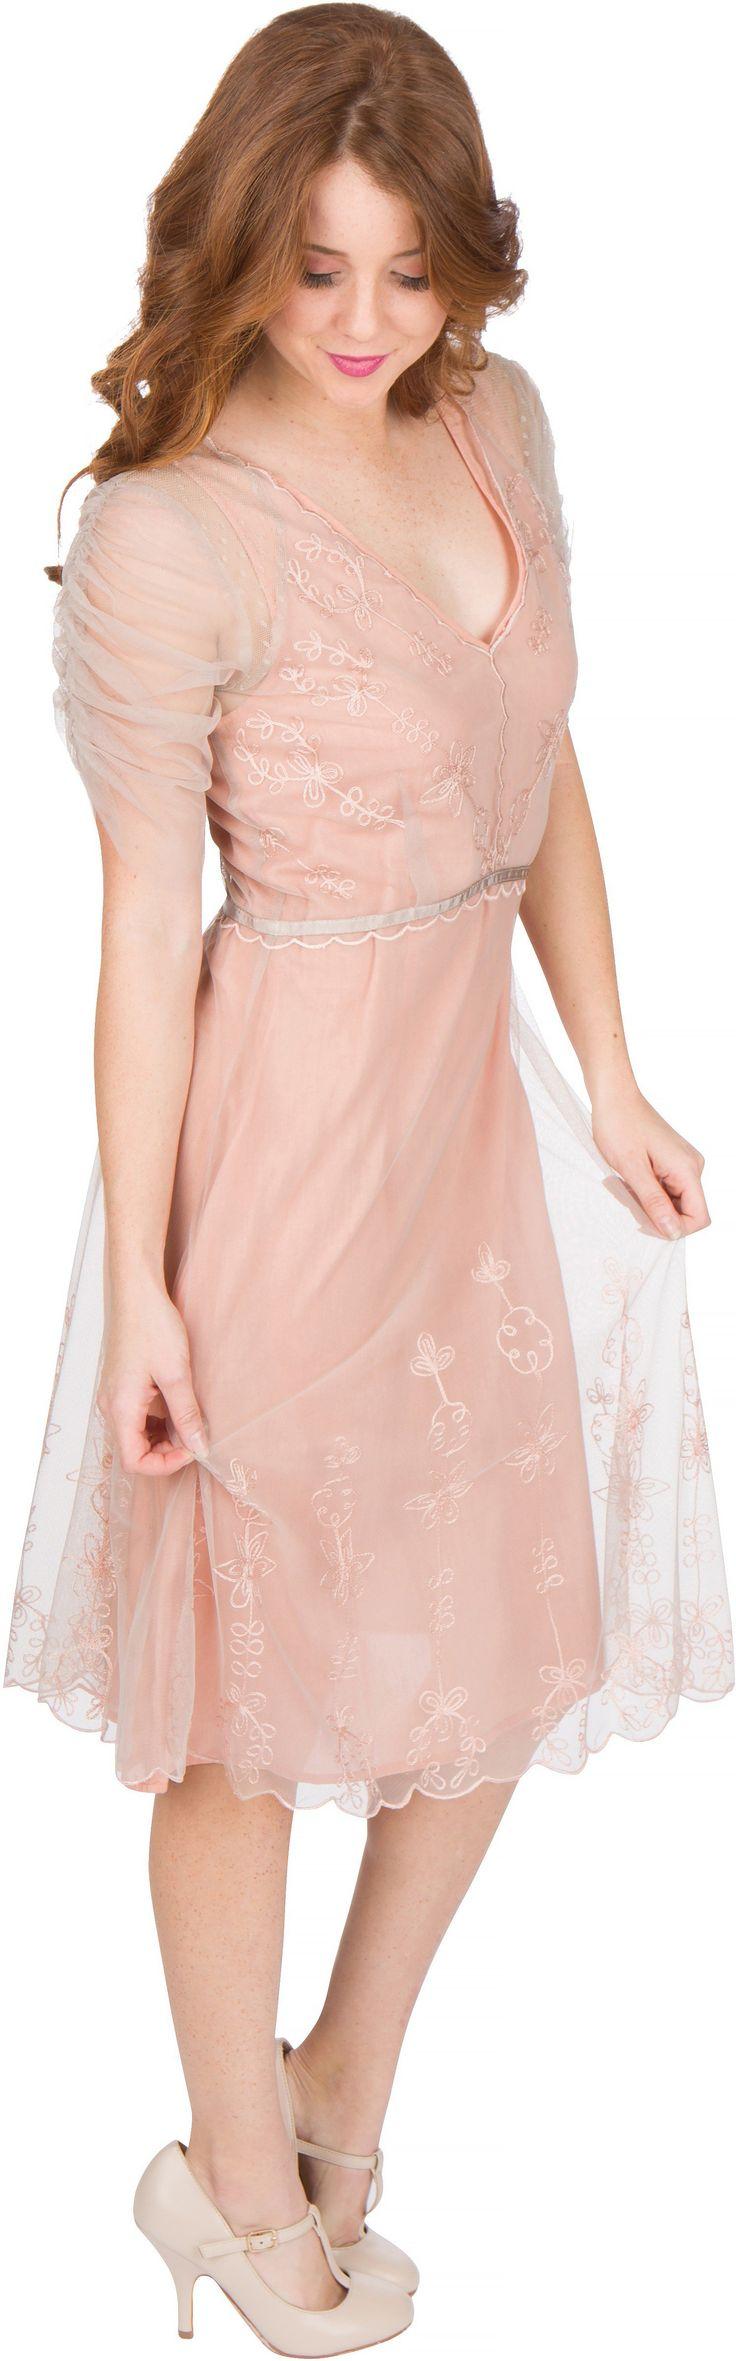 Scarlett Vintage Style Party 1920s Great Gtasby Dress in Quartz by Nataya $172.00 AT vintagedancer.com